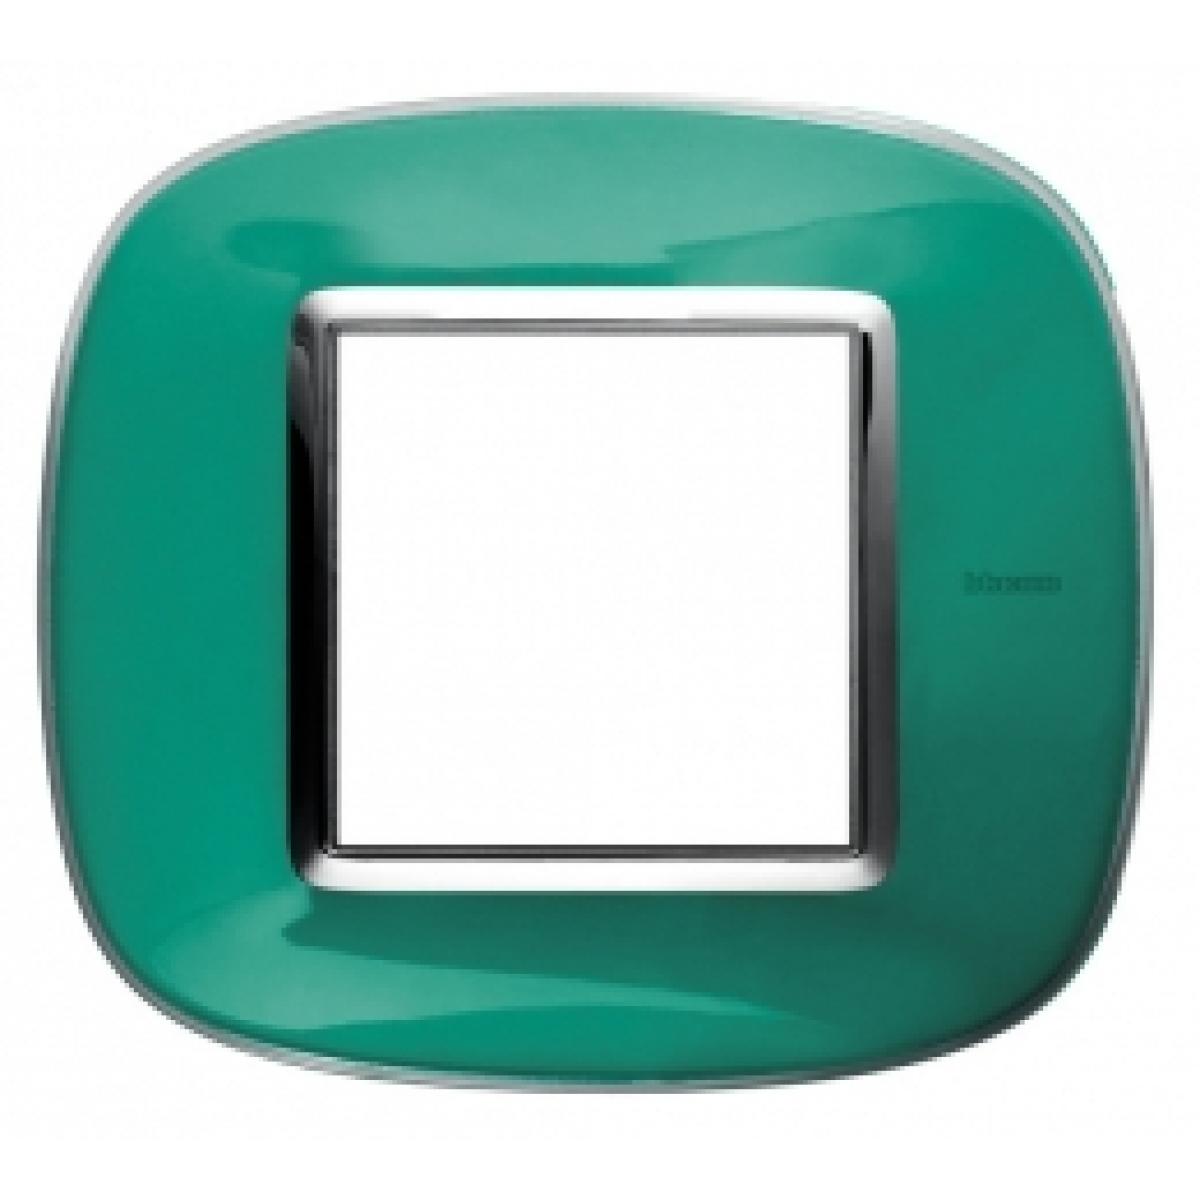 Placca Ovale 2 Posti Bticino Axolute Verde Liquido HB4802DV